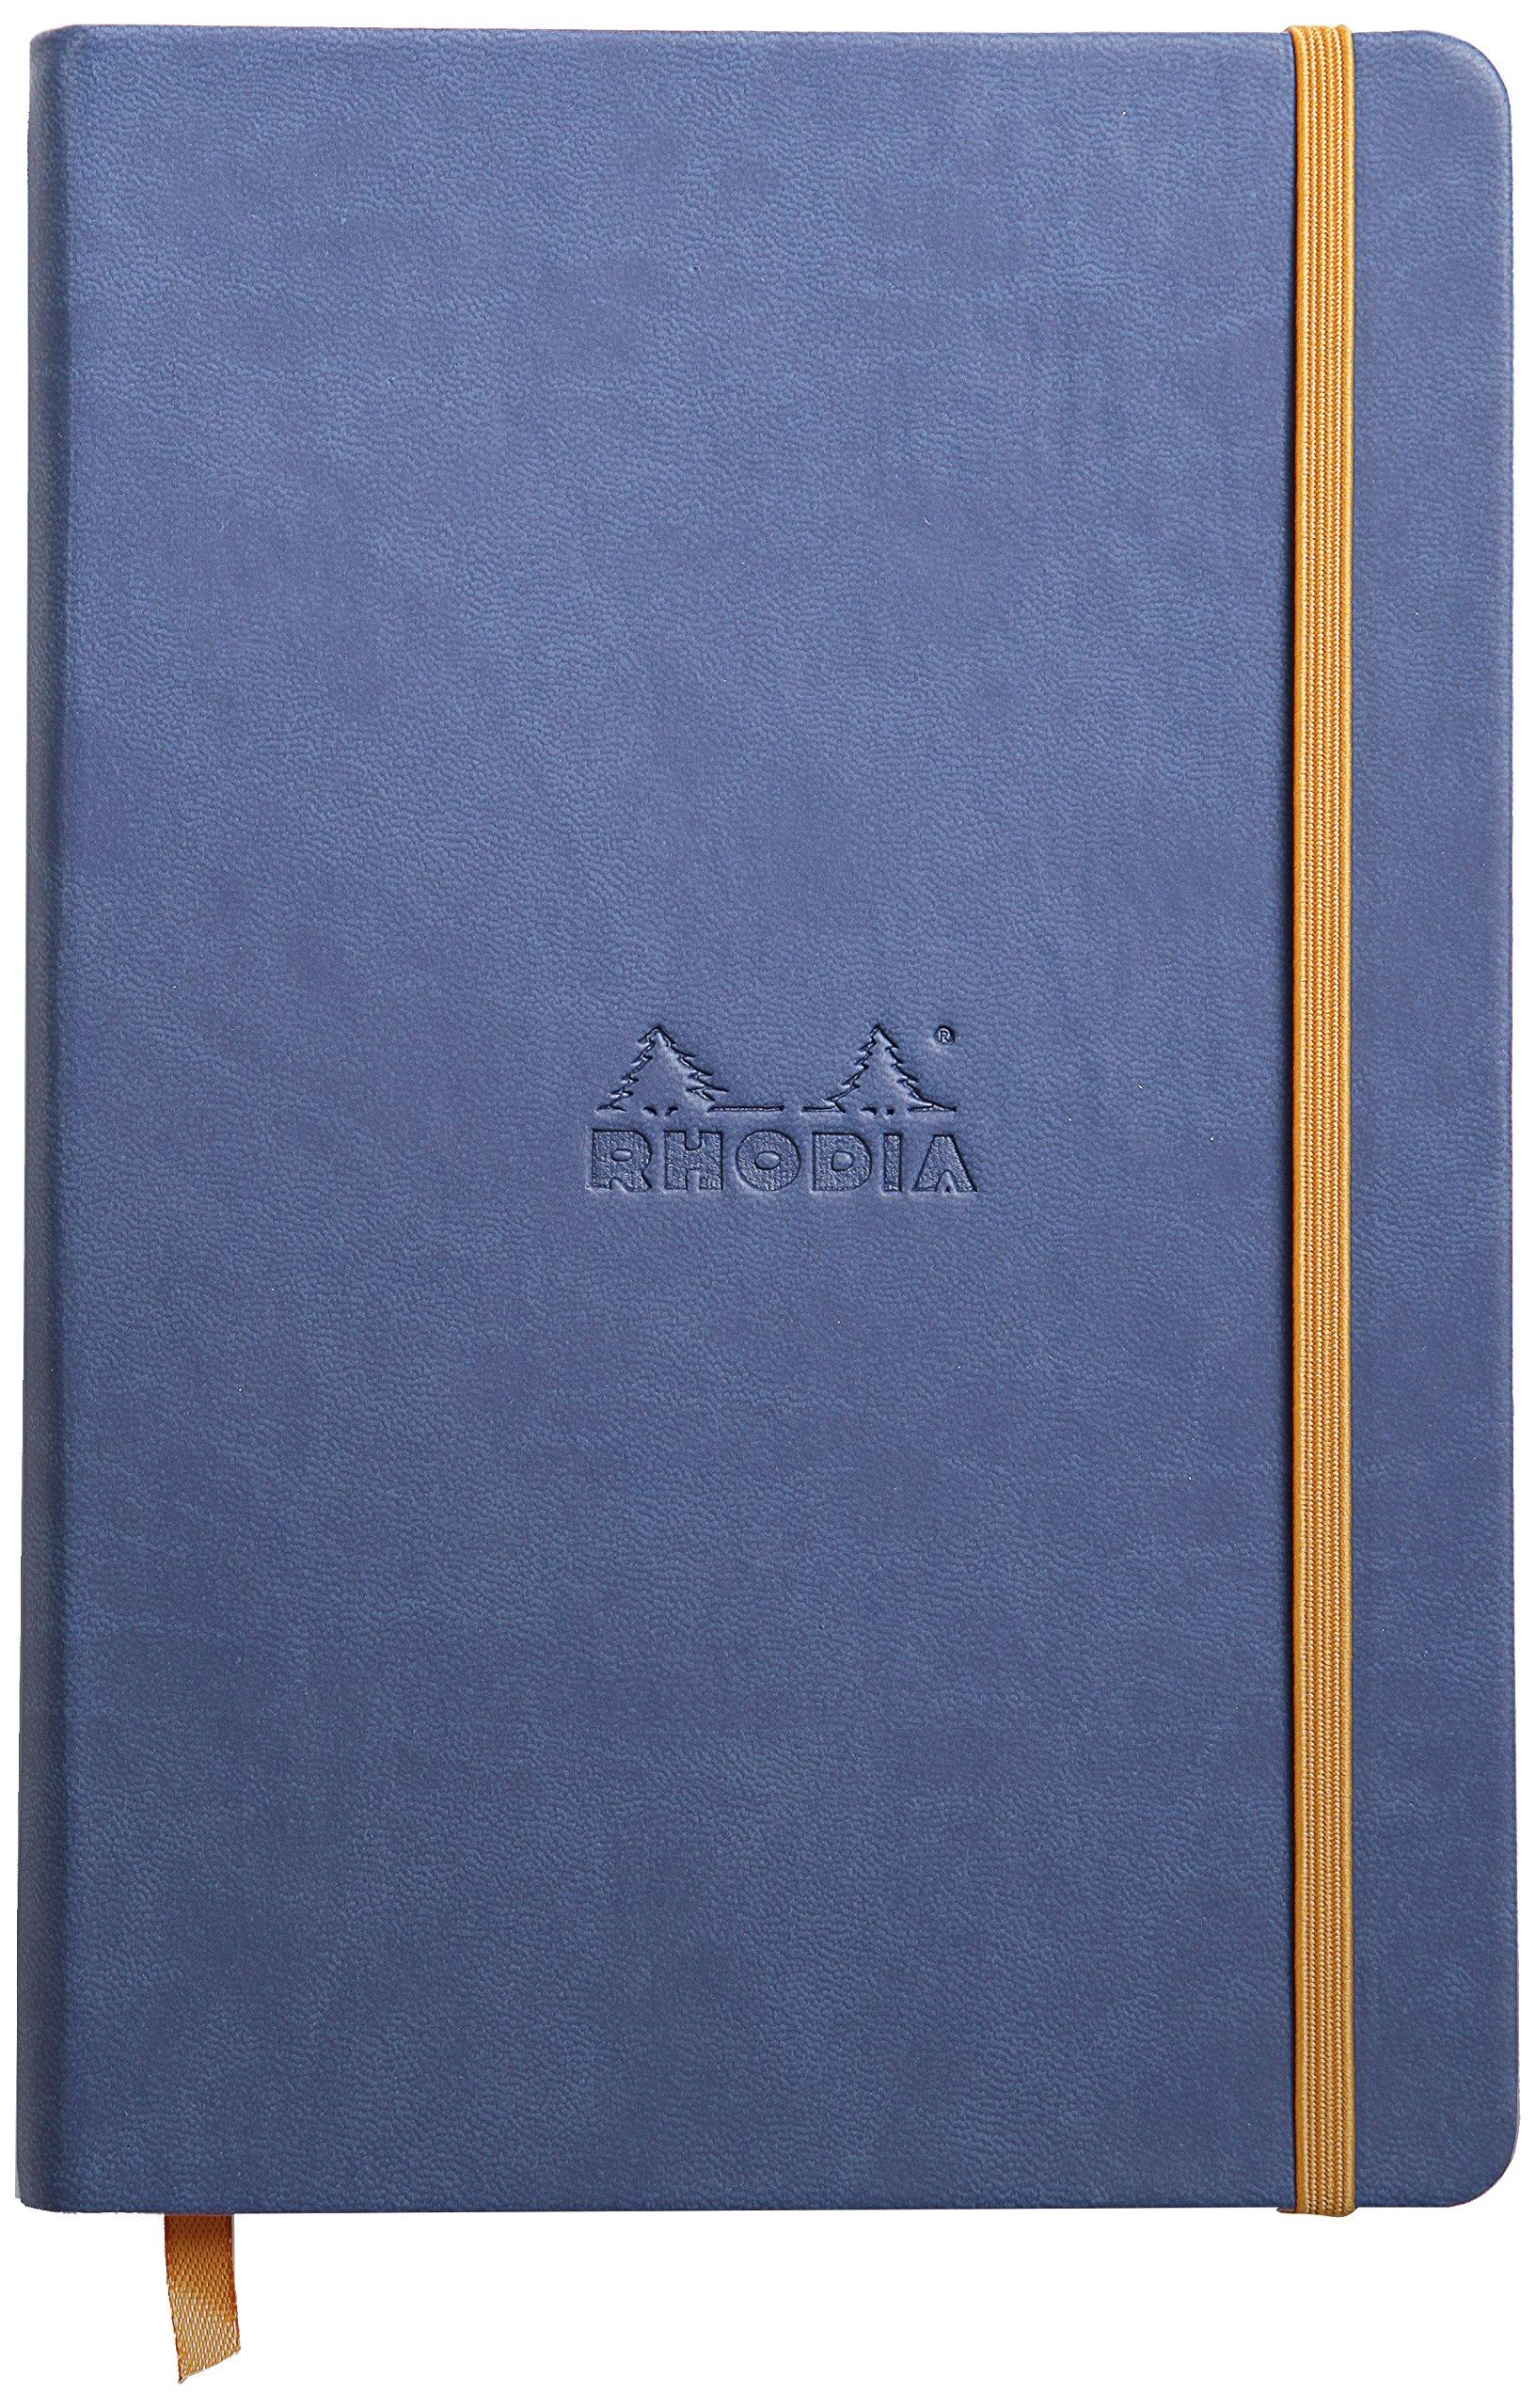 Rhodia Rhodiarama A5 Webnotebook, 5.5 in x 8.25, Lined - Sapphire (118748)